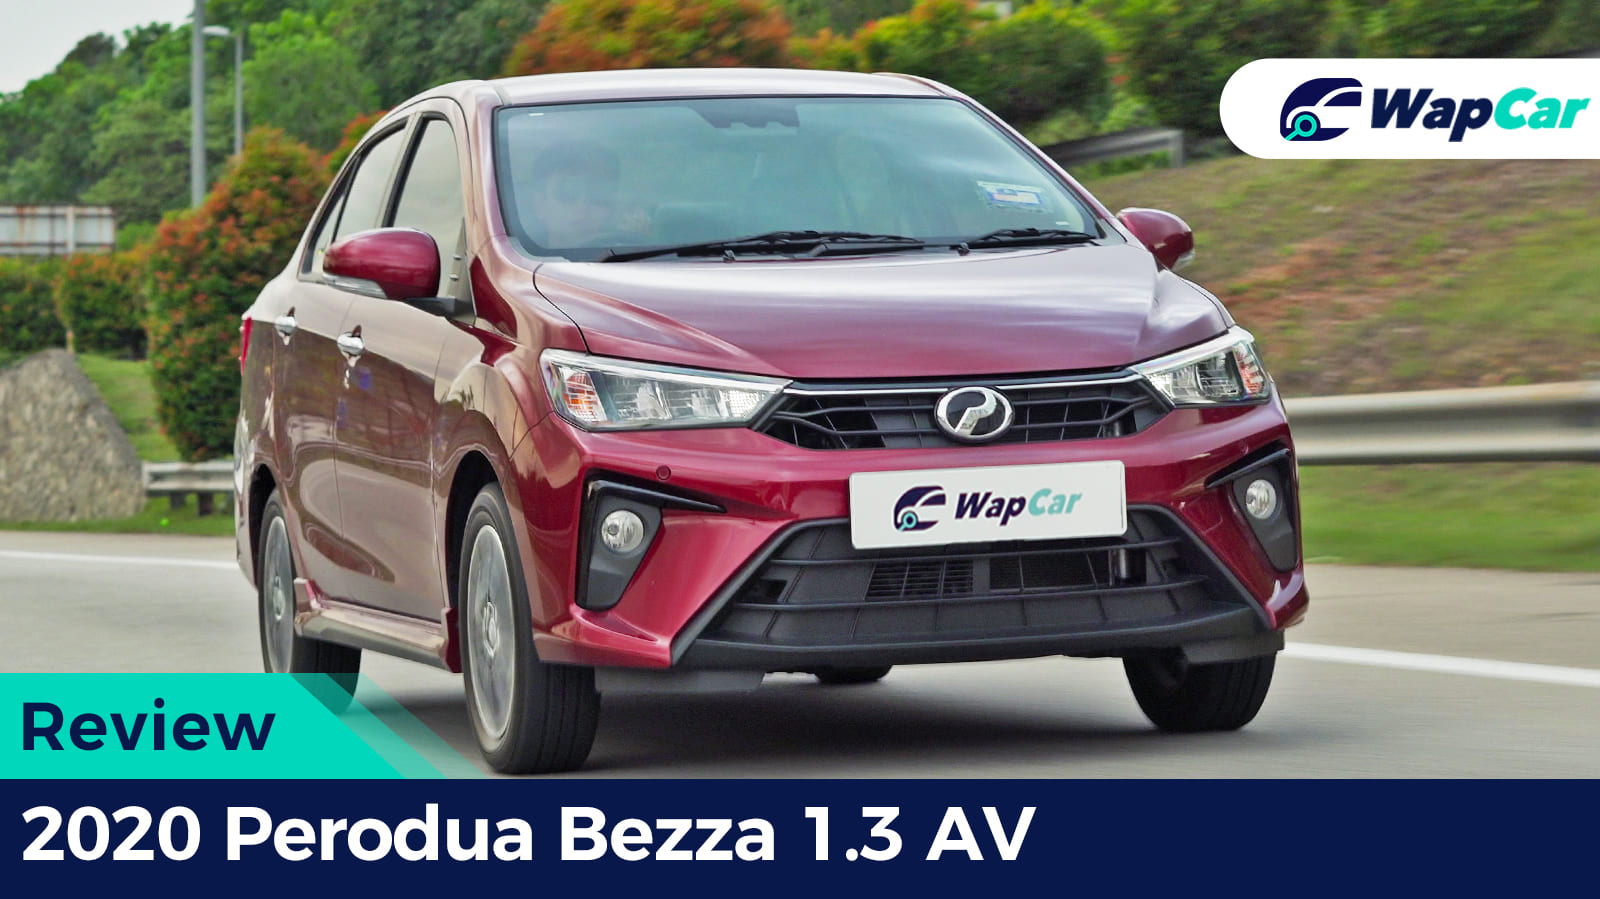 2020 Perodua Bezza 1.3 Review